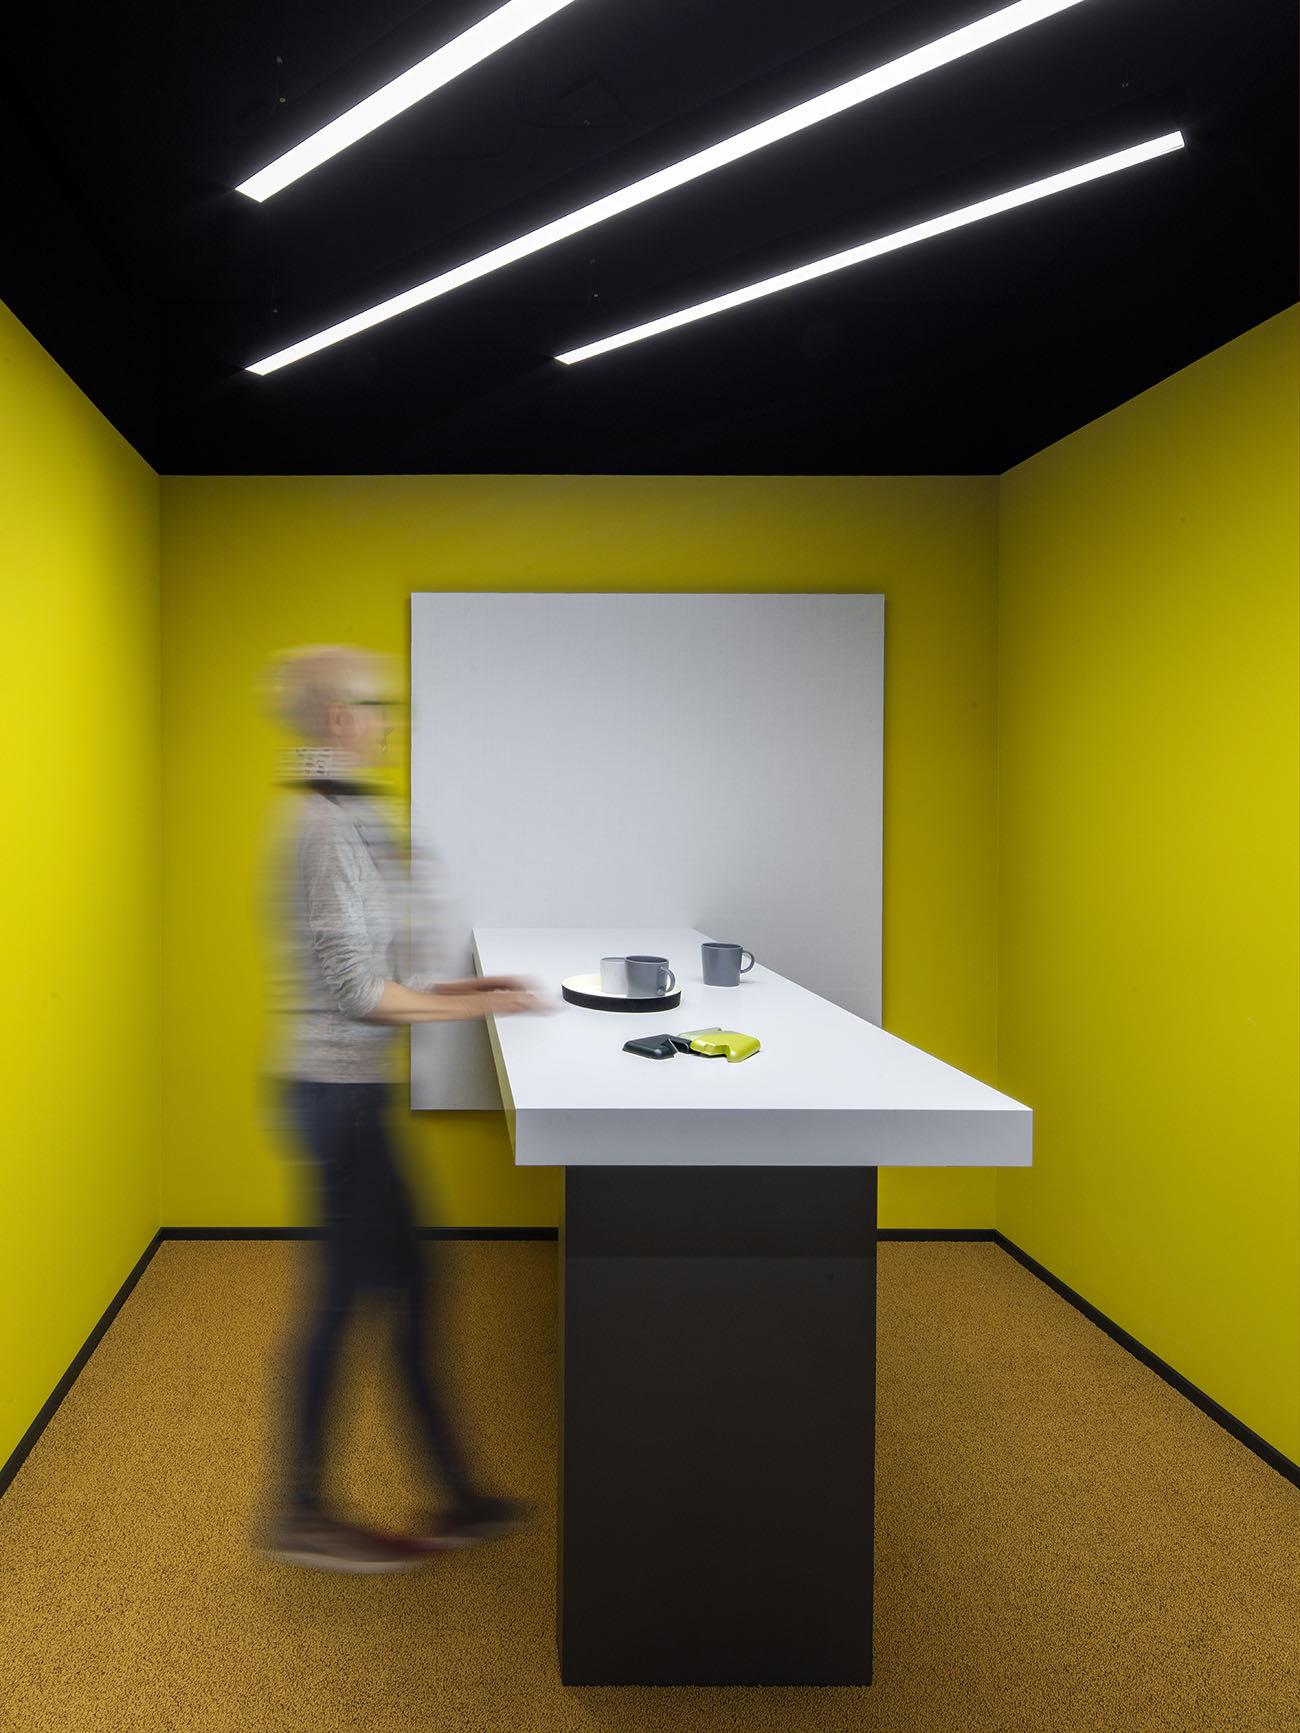 woerwag-stuttgart-office-11